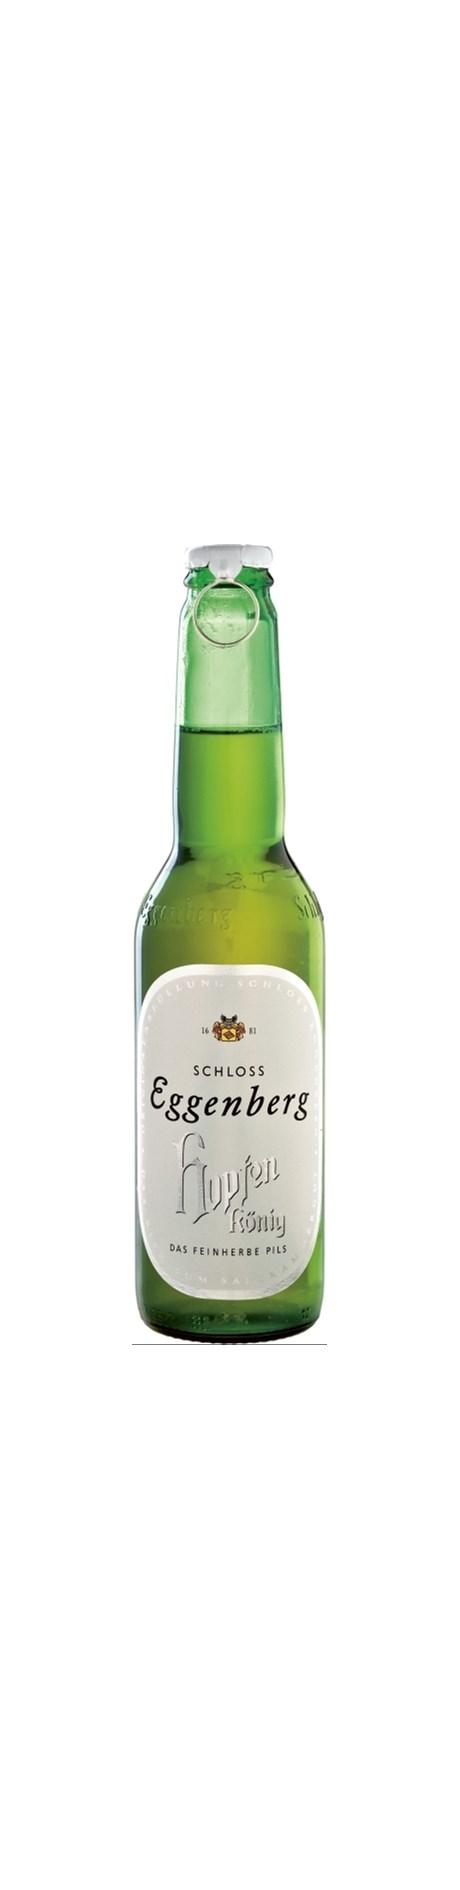 Eggenberg Hopfenkonig 330ml